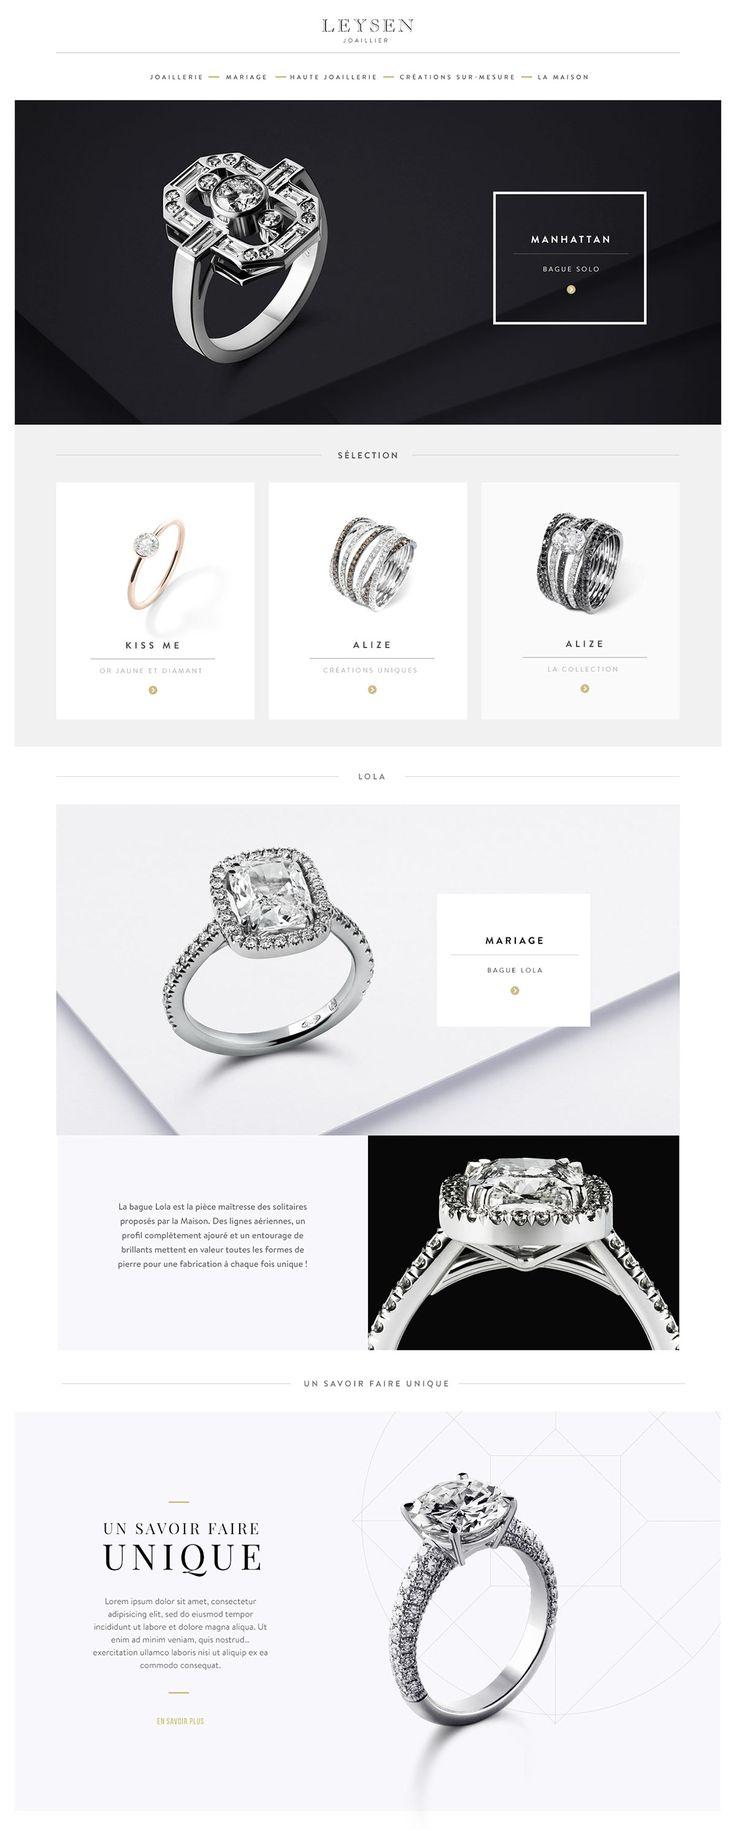 Jewellery maker Leysen brand new website